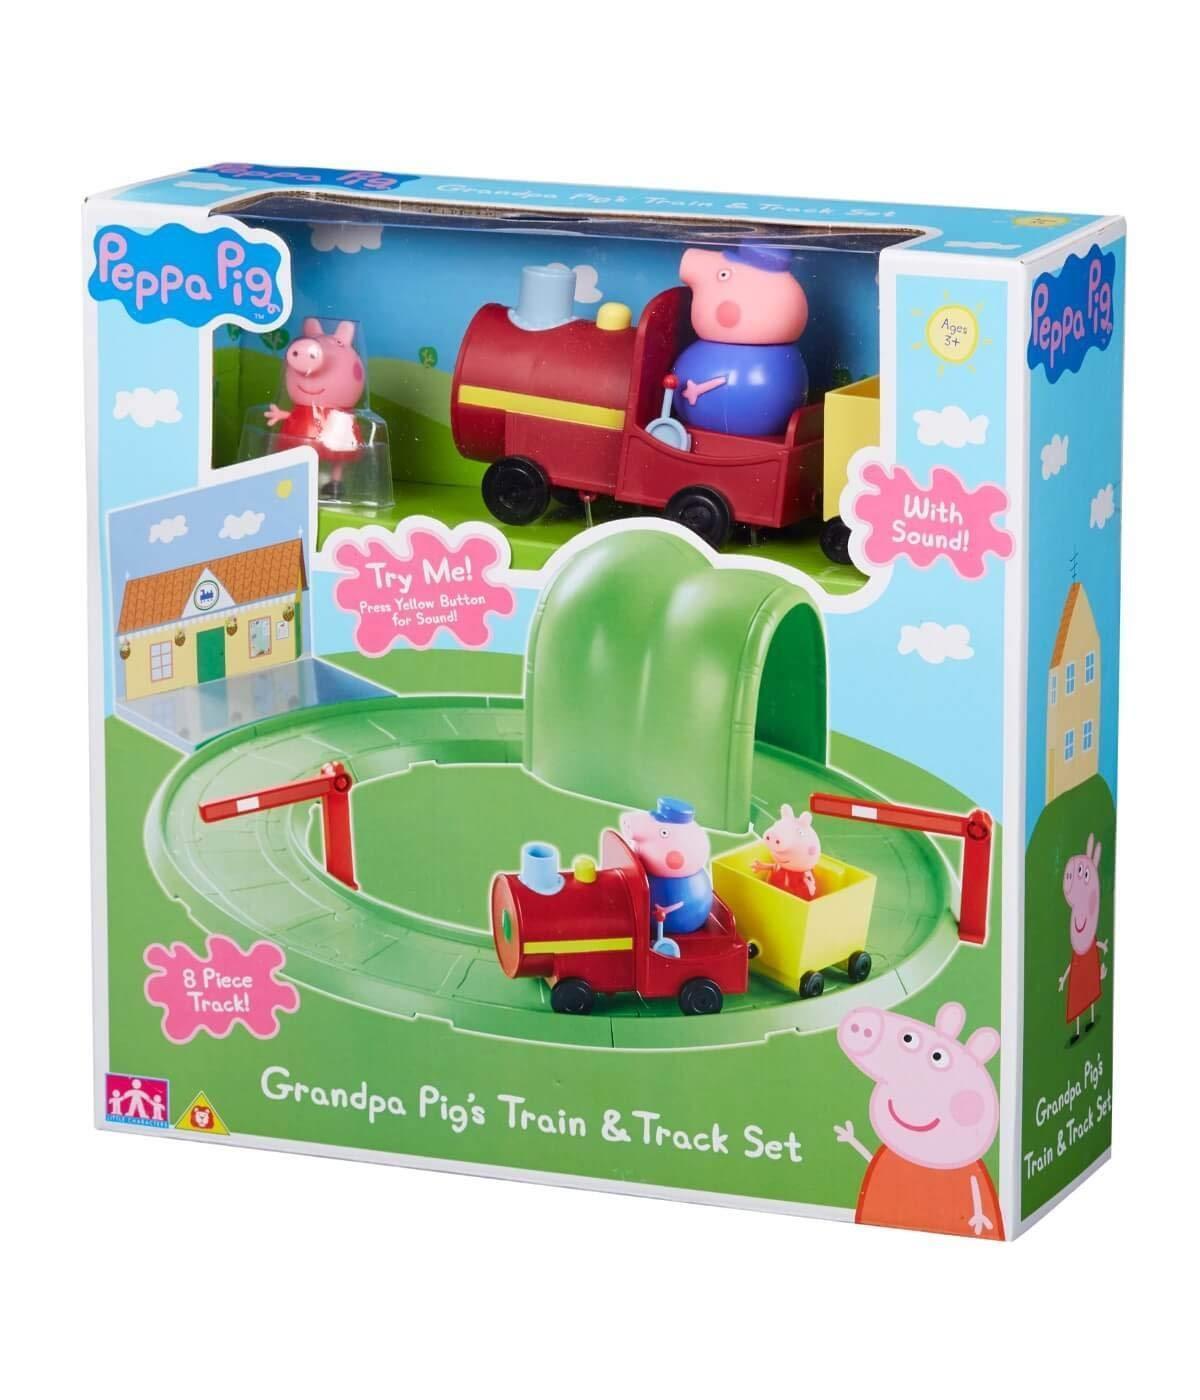 Peppa Pig Grandpa Pig Tren & Set de Pista con Sonido Playset de Juguete